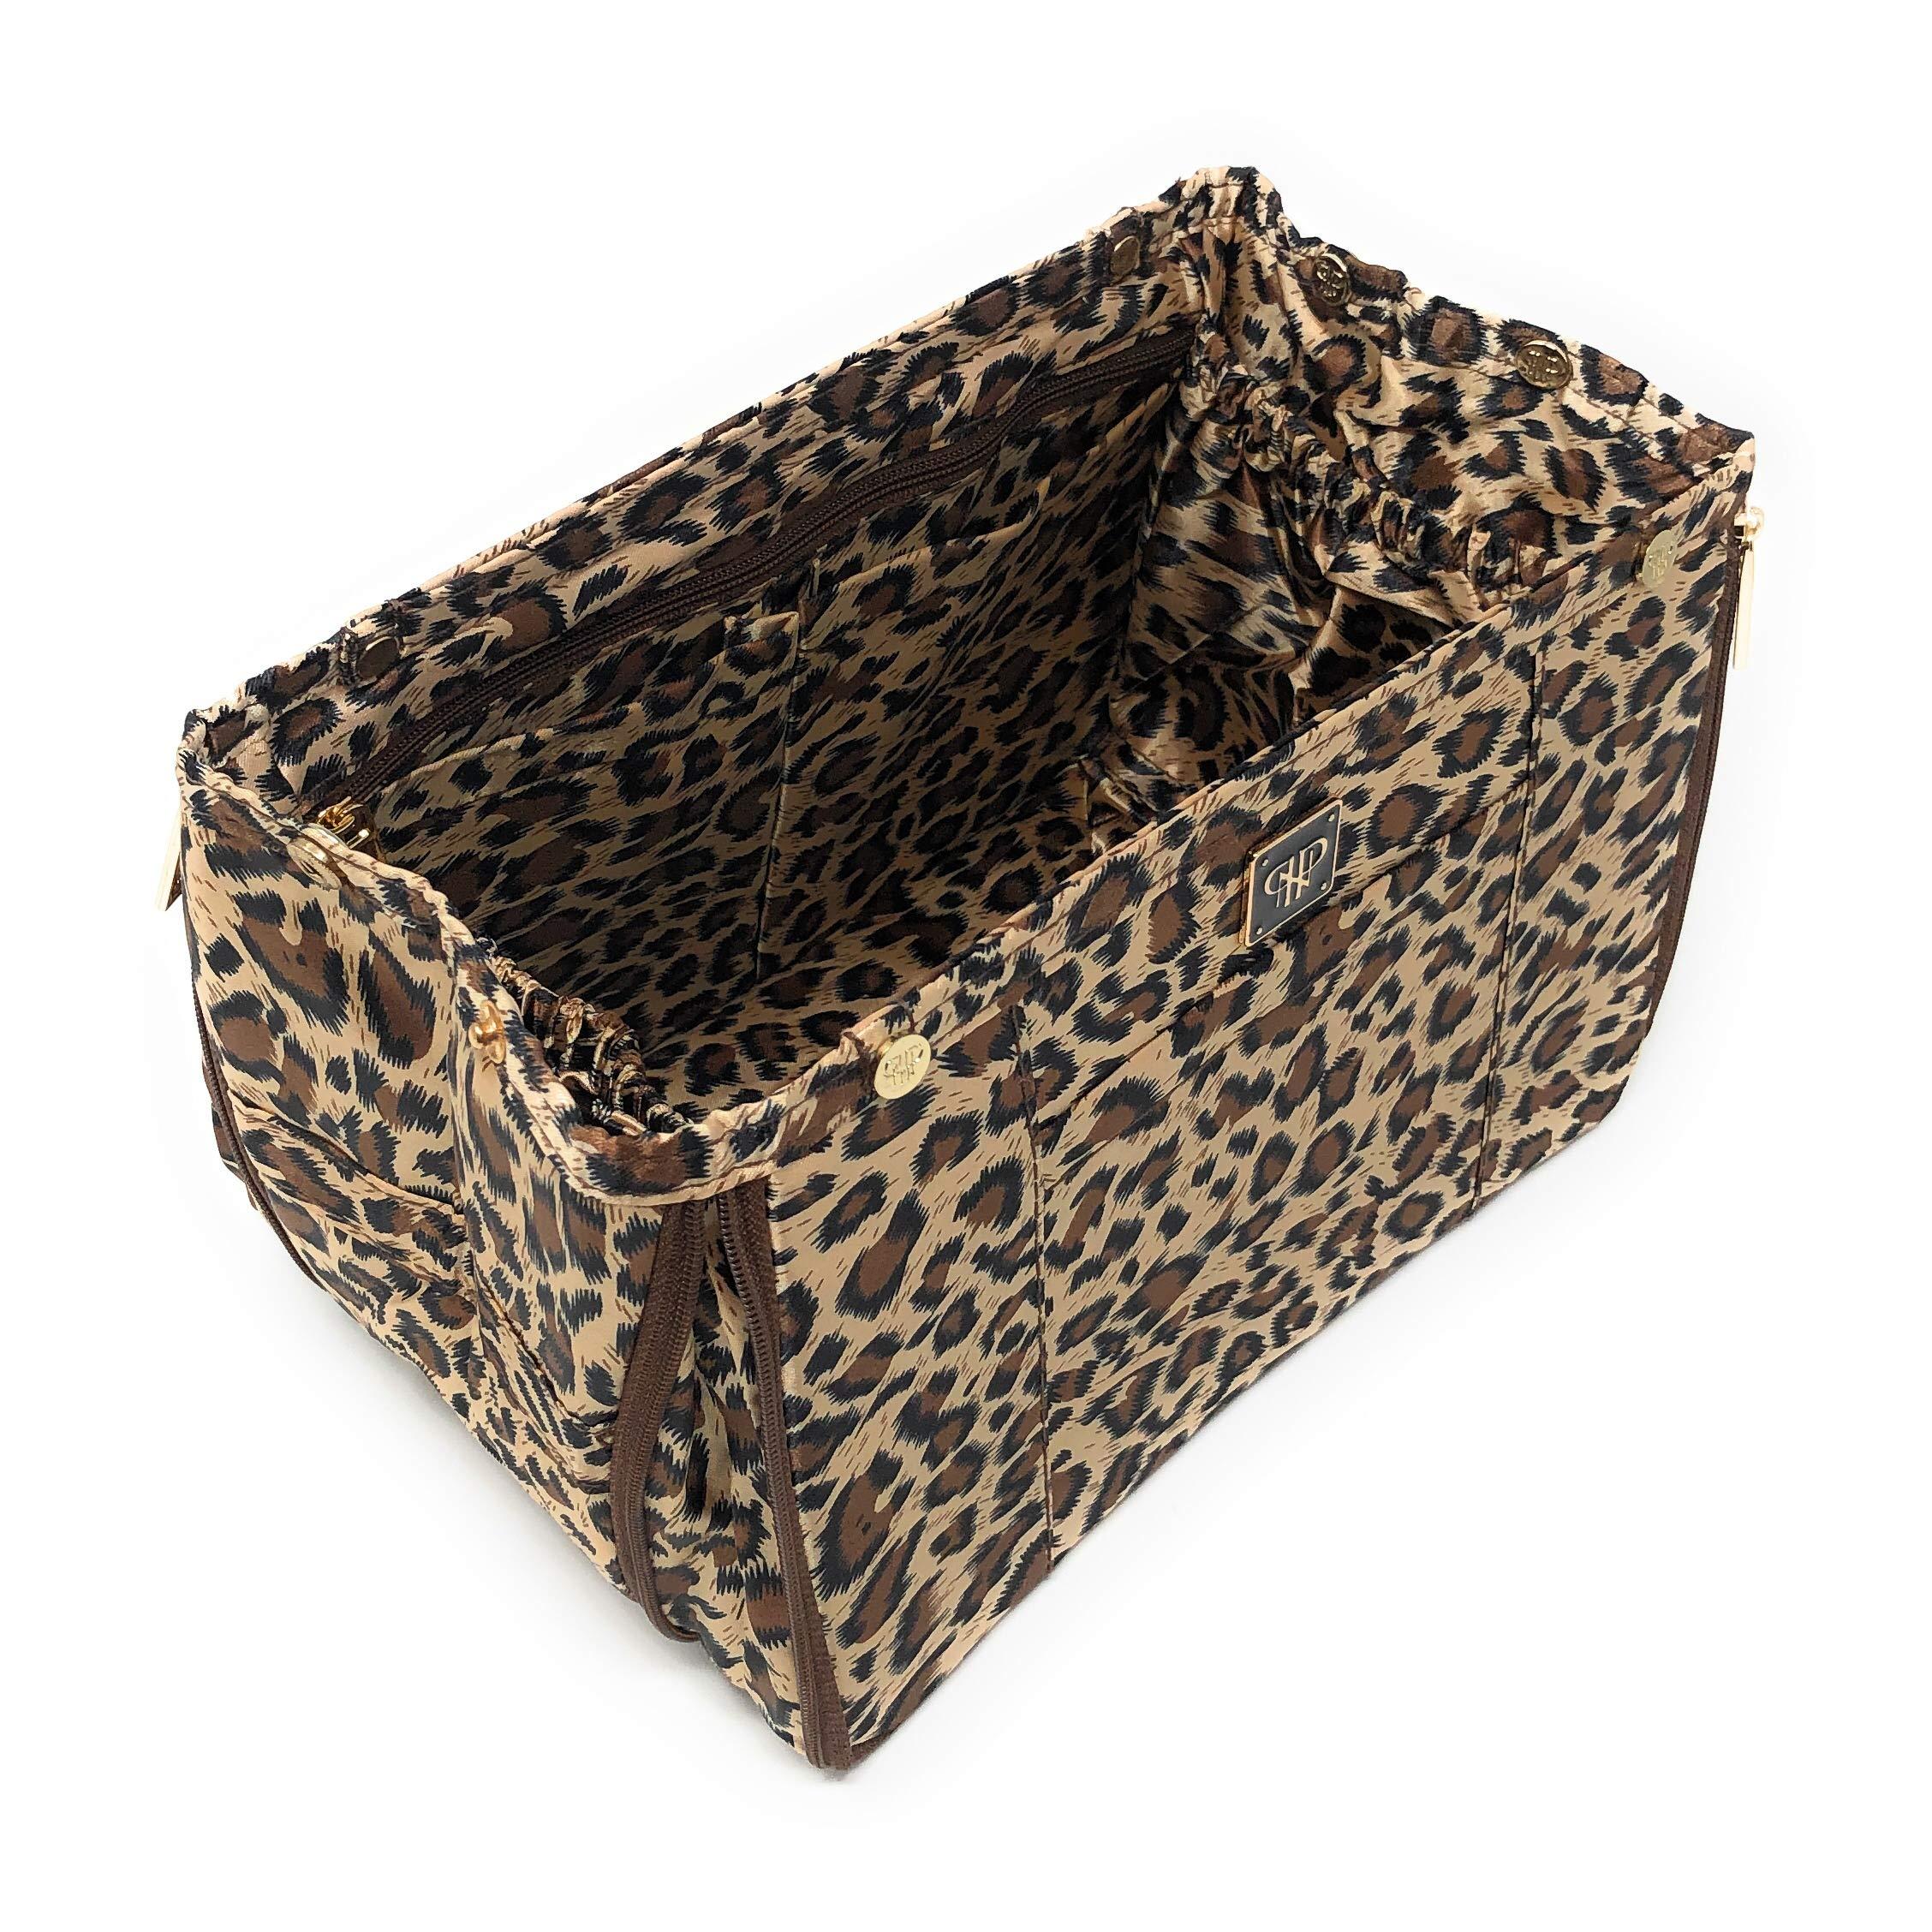 PurseN Organizer Insert (Small, Leopard/ Leopard) by PurseN